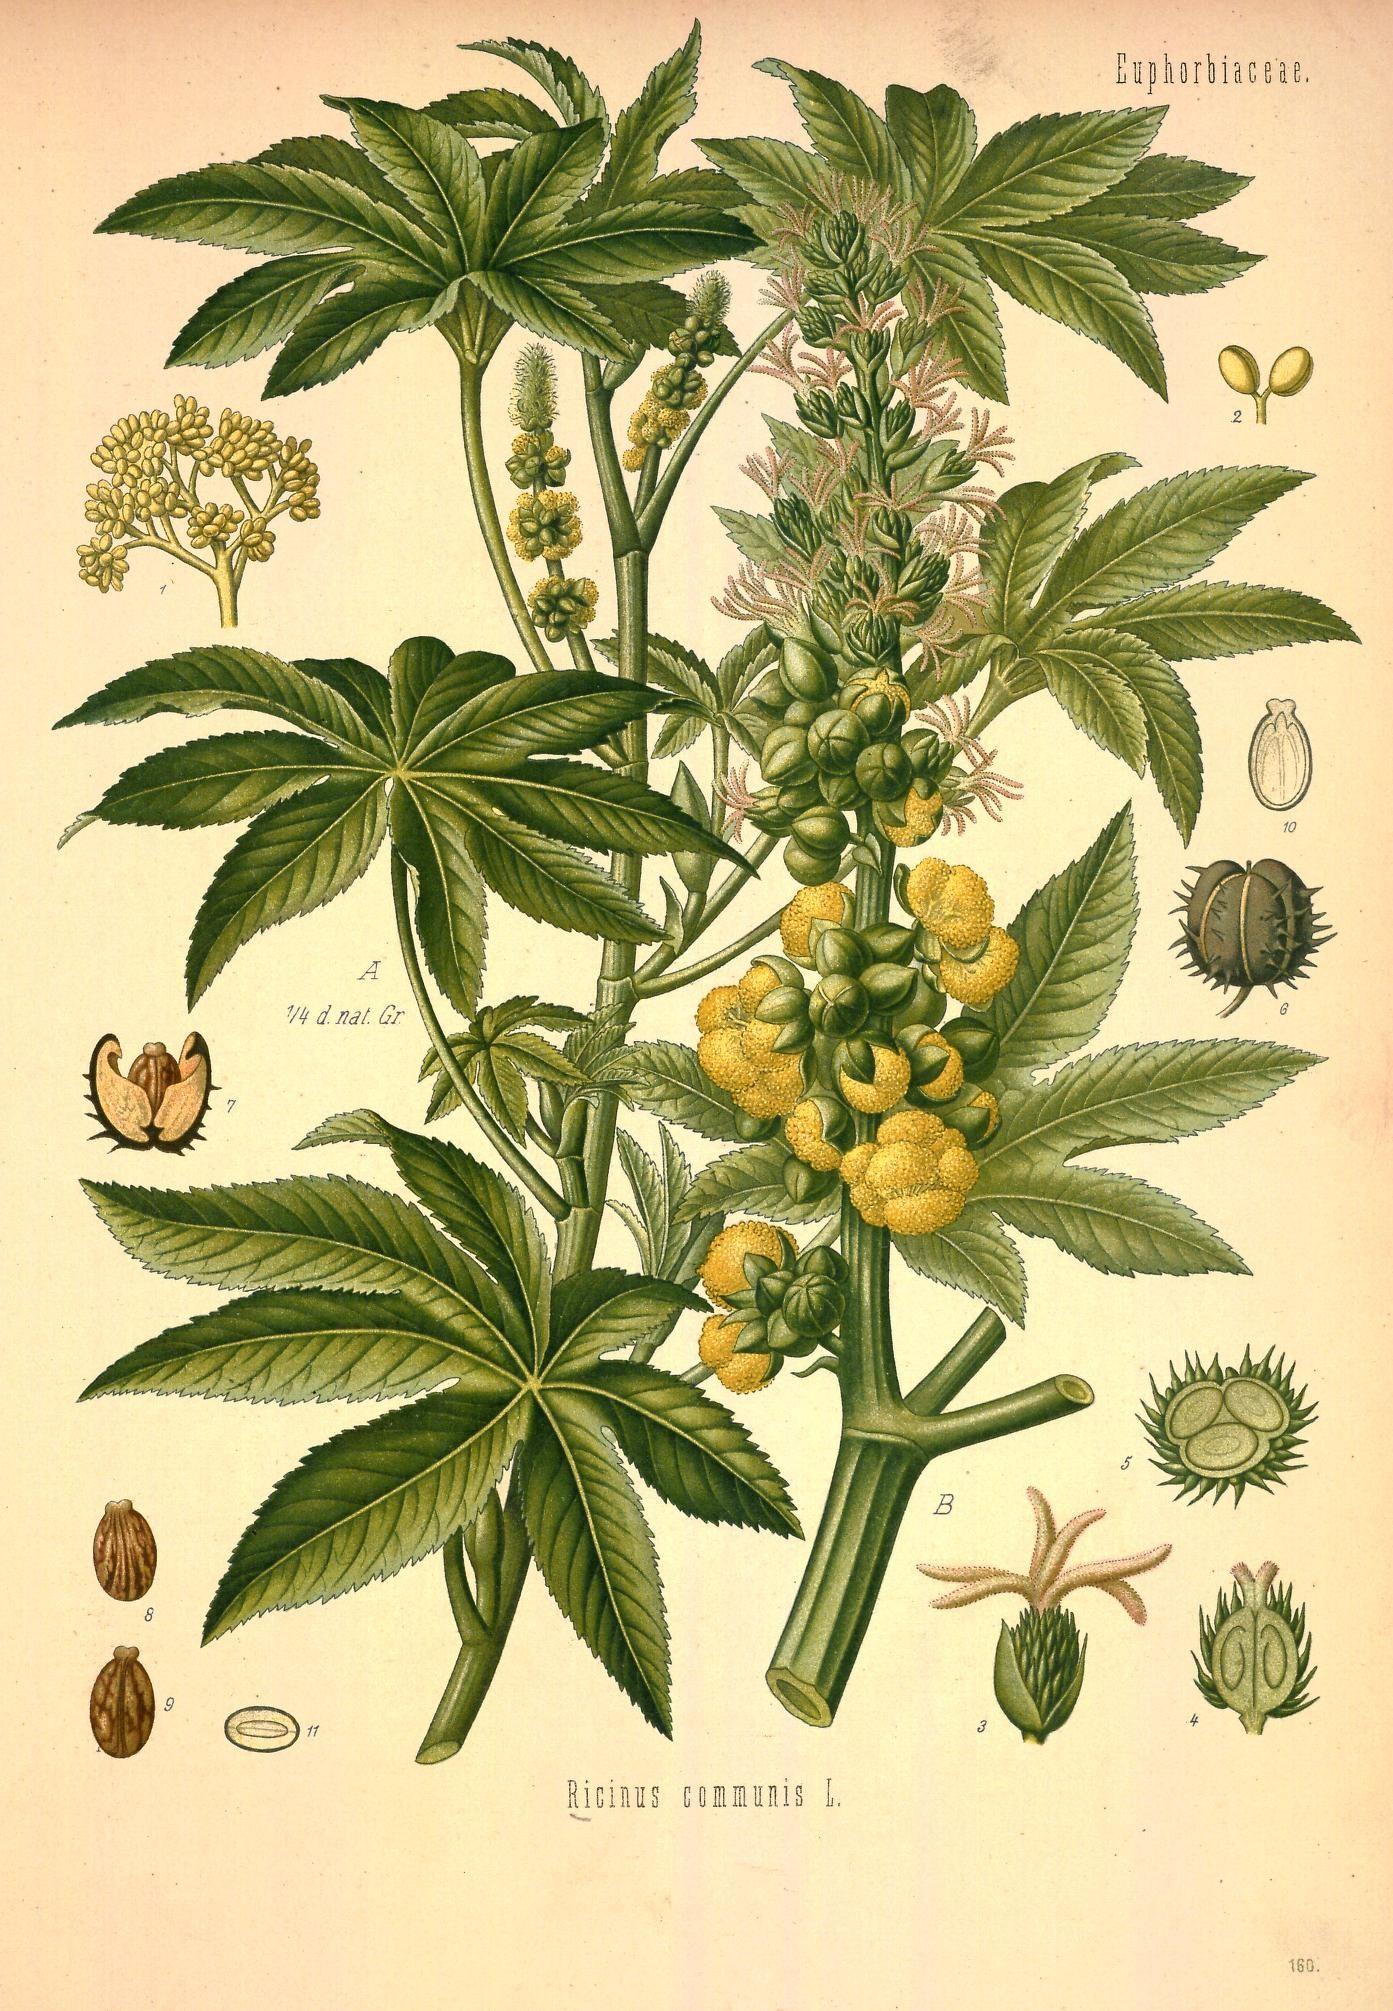 Köhler's Medizinal-Pflanzen in naturgetreuen Abbildungen mit kurz erläuterndem Texte (Plate 160) (8232808238).jpg